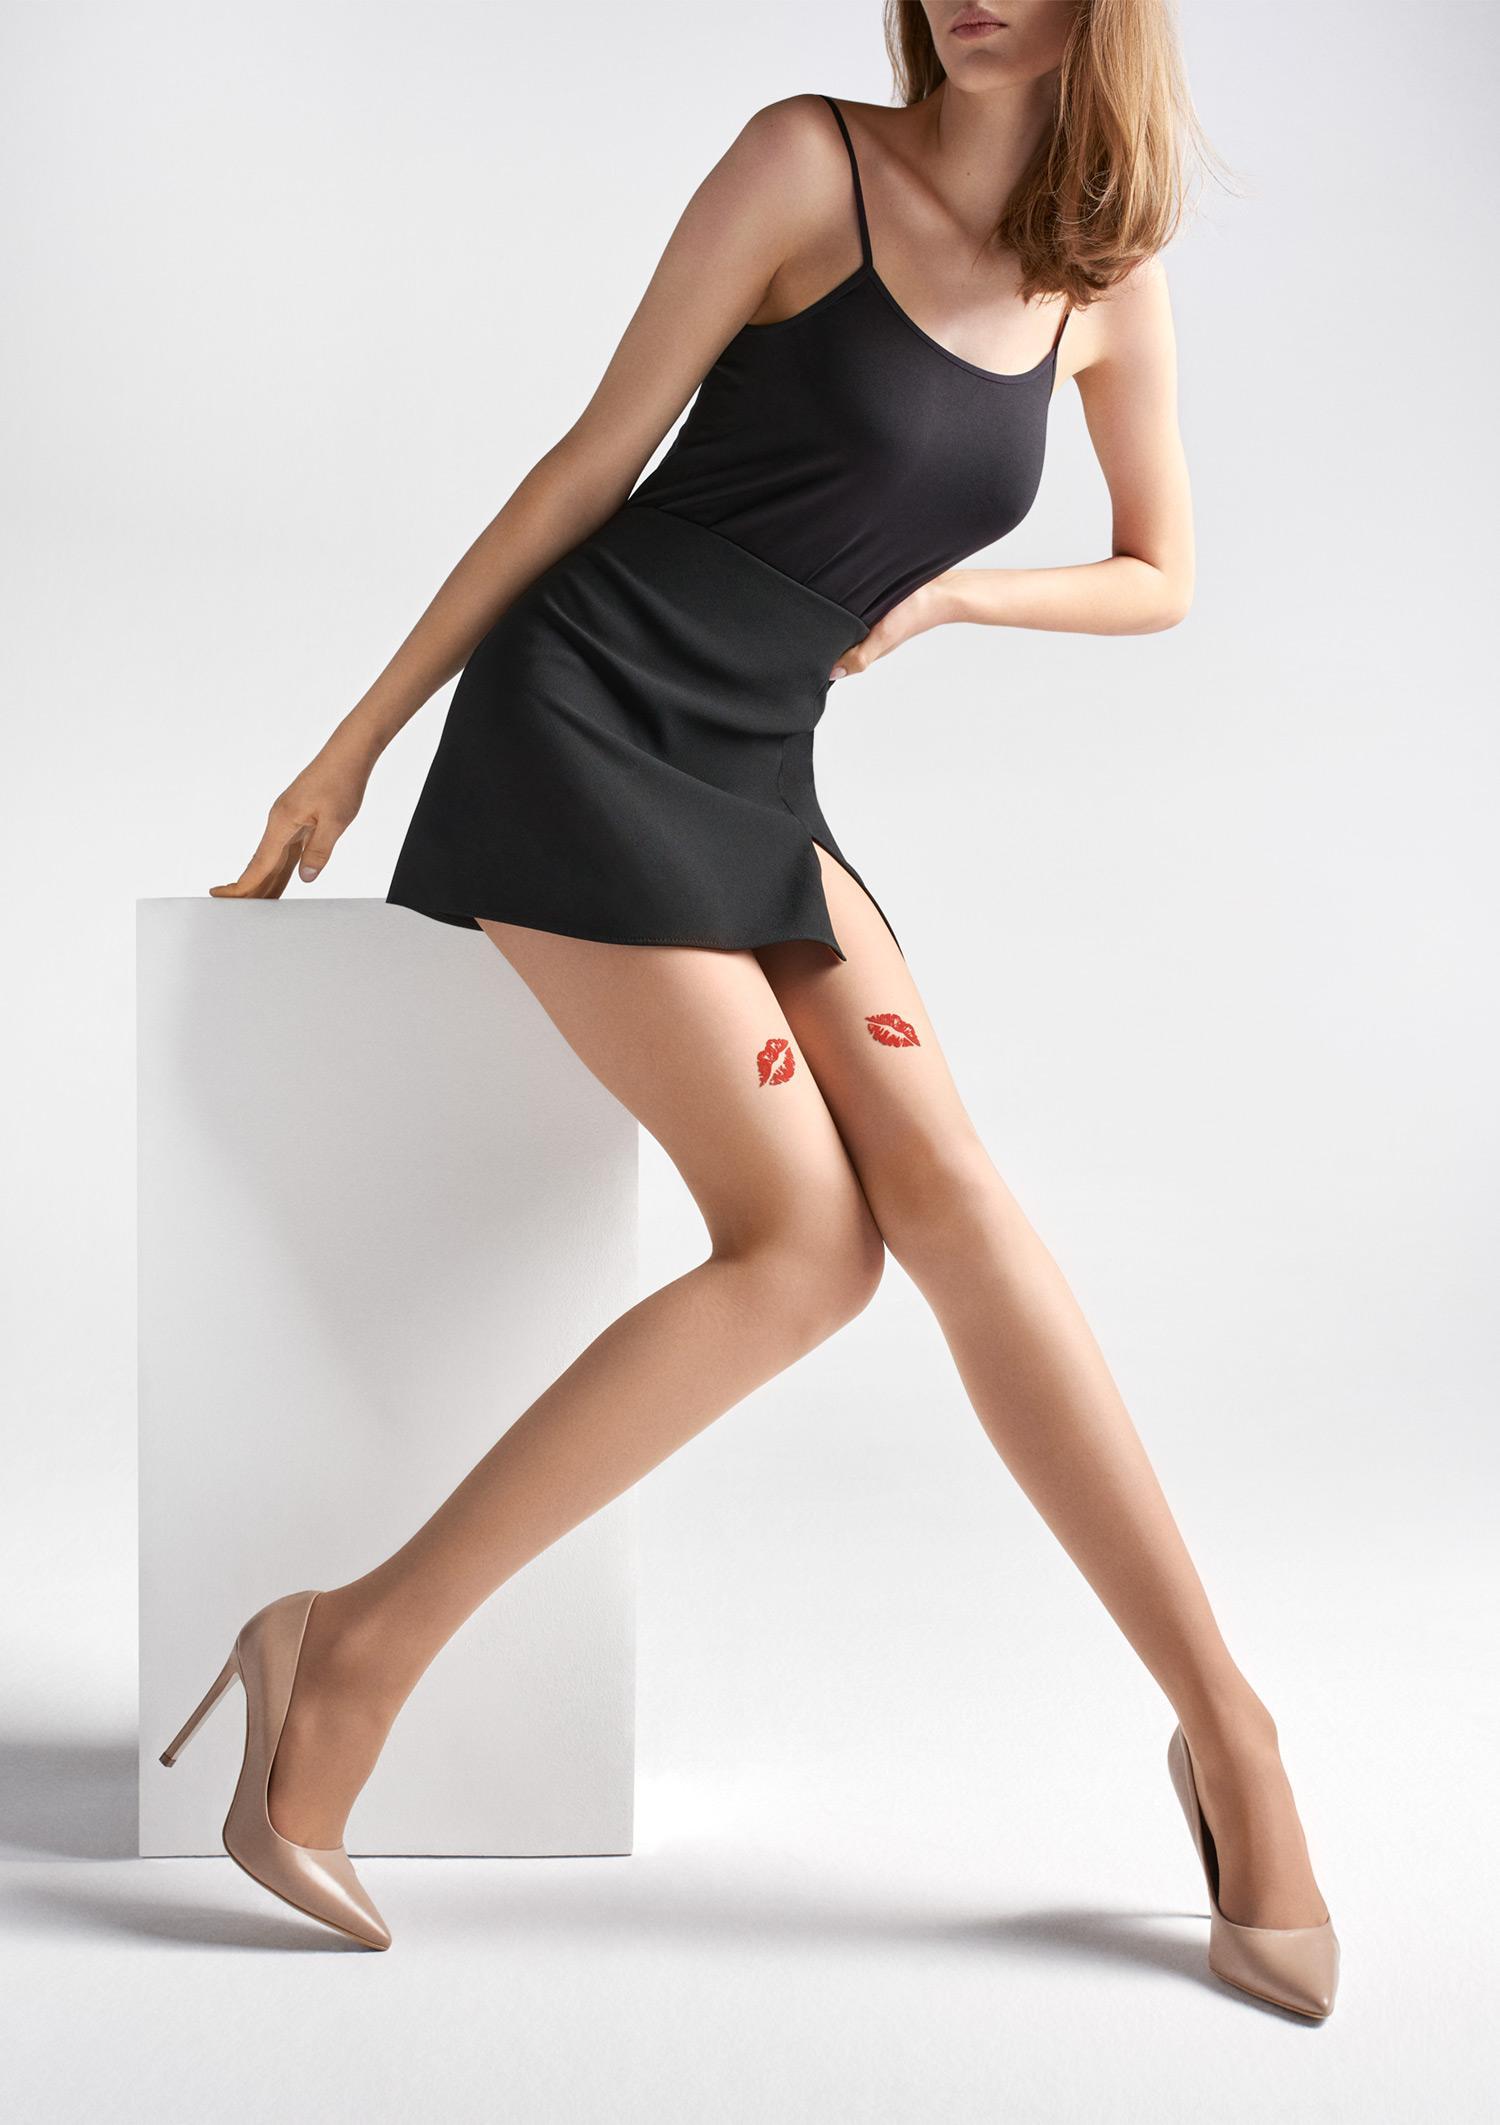 https://golden-legs.com.ua/images/stories/virtuemart/product/gladkie-rajstopy-z-wzorem-ust-na-udach-allure-u06-marilyn_1.jpg